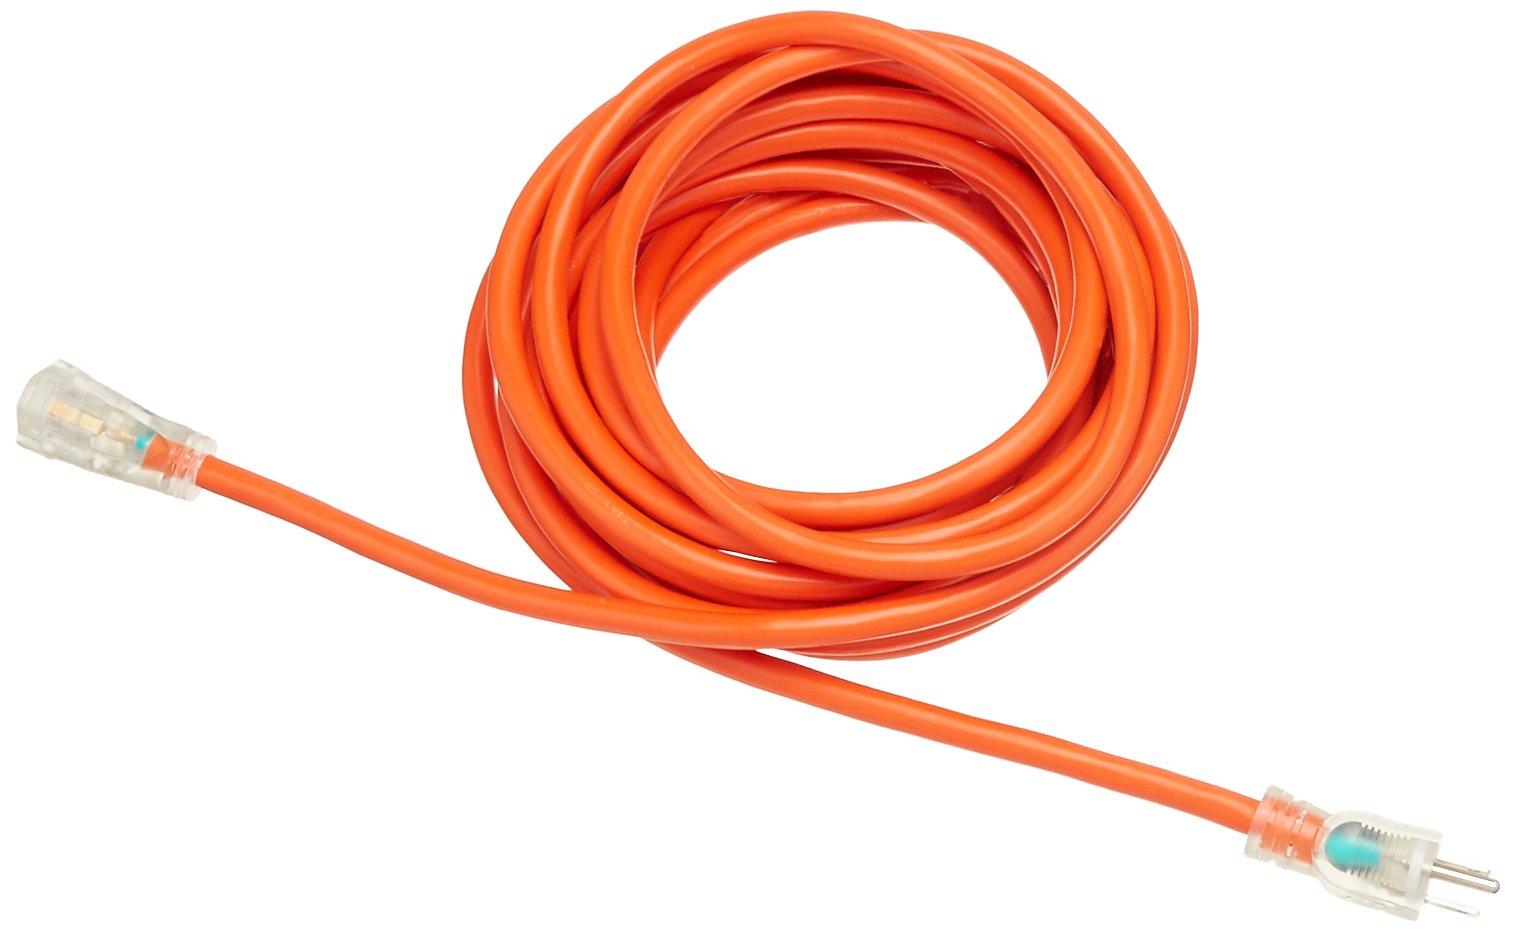 AmazonBasics 12/3 SJTW Heavy-Duty Lighted Extension Cord - 25 Feet (Orange)